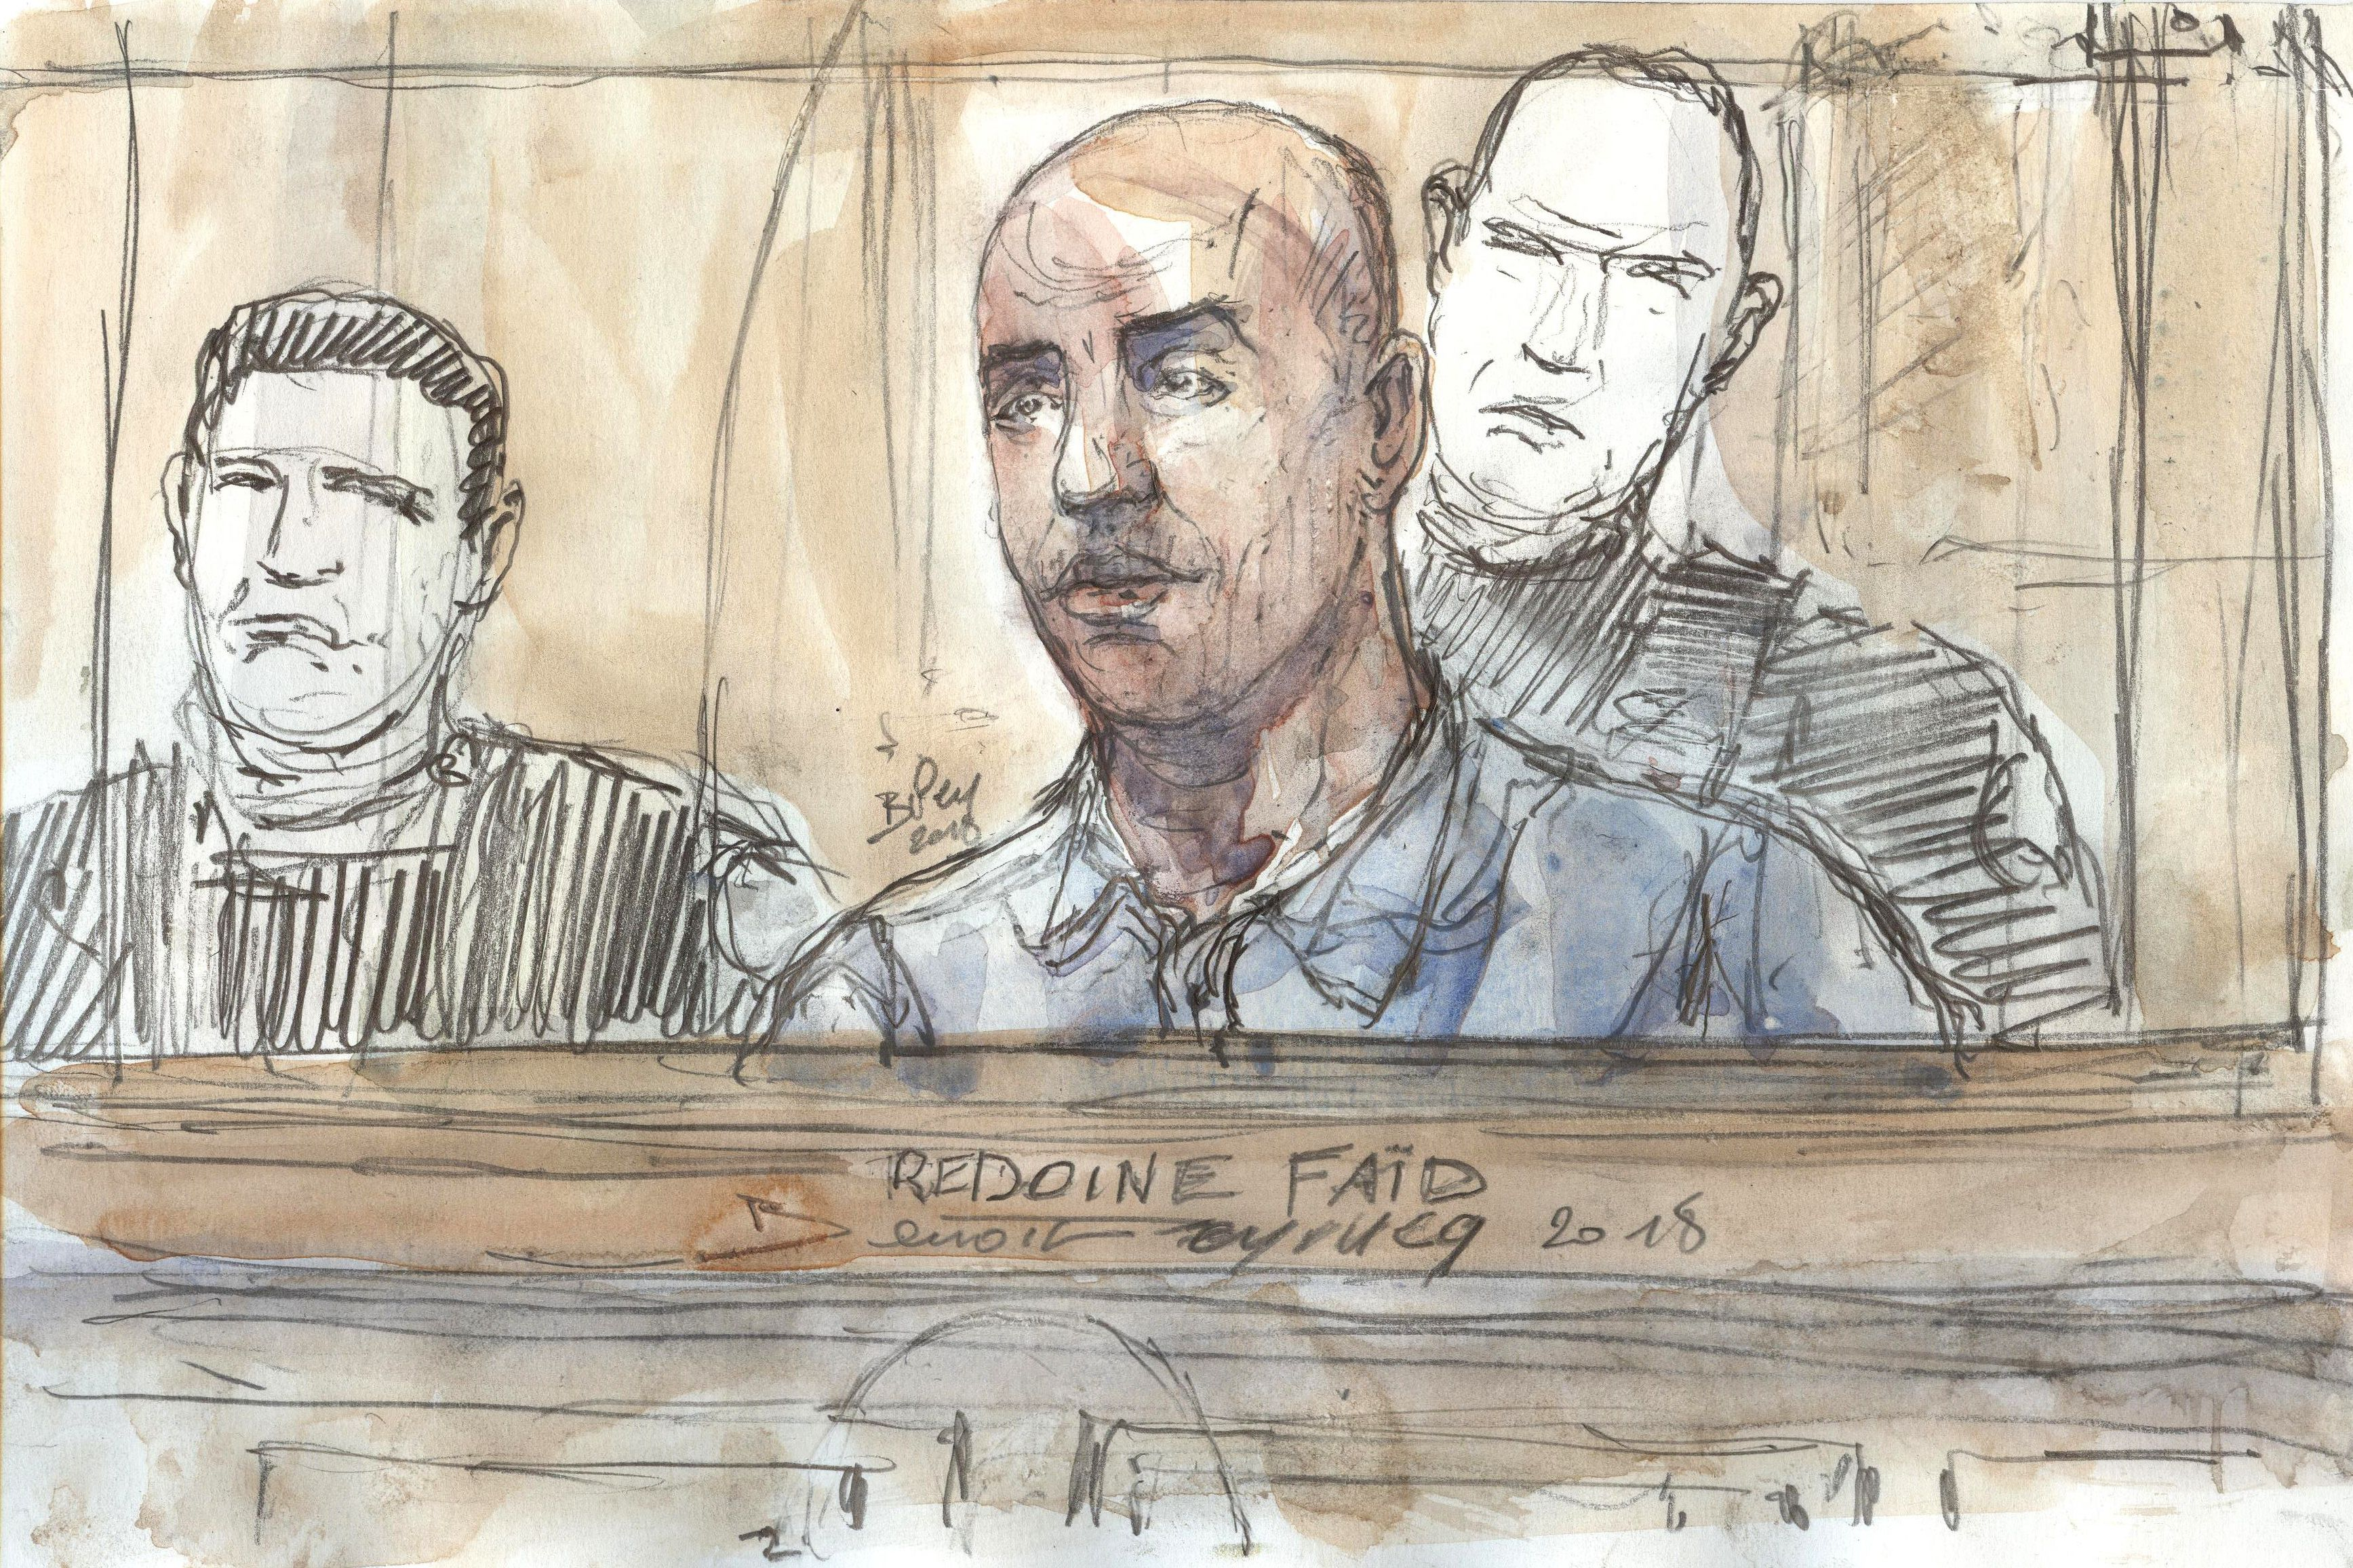 Redoine Faid in court